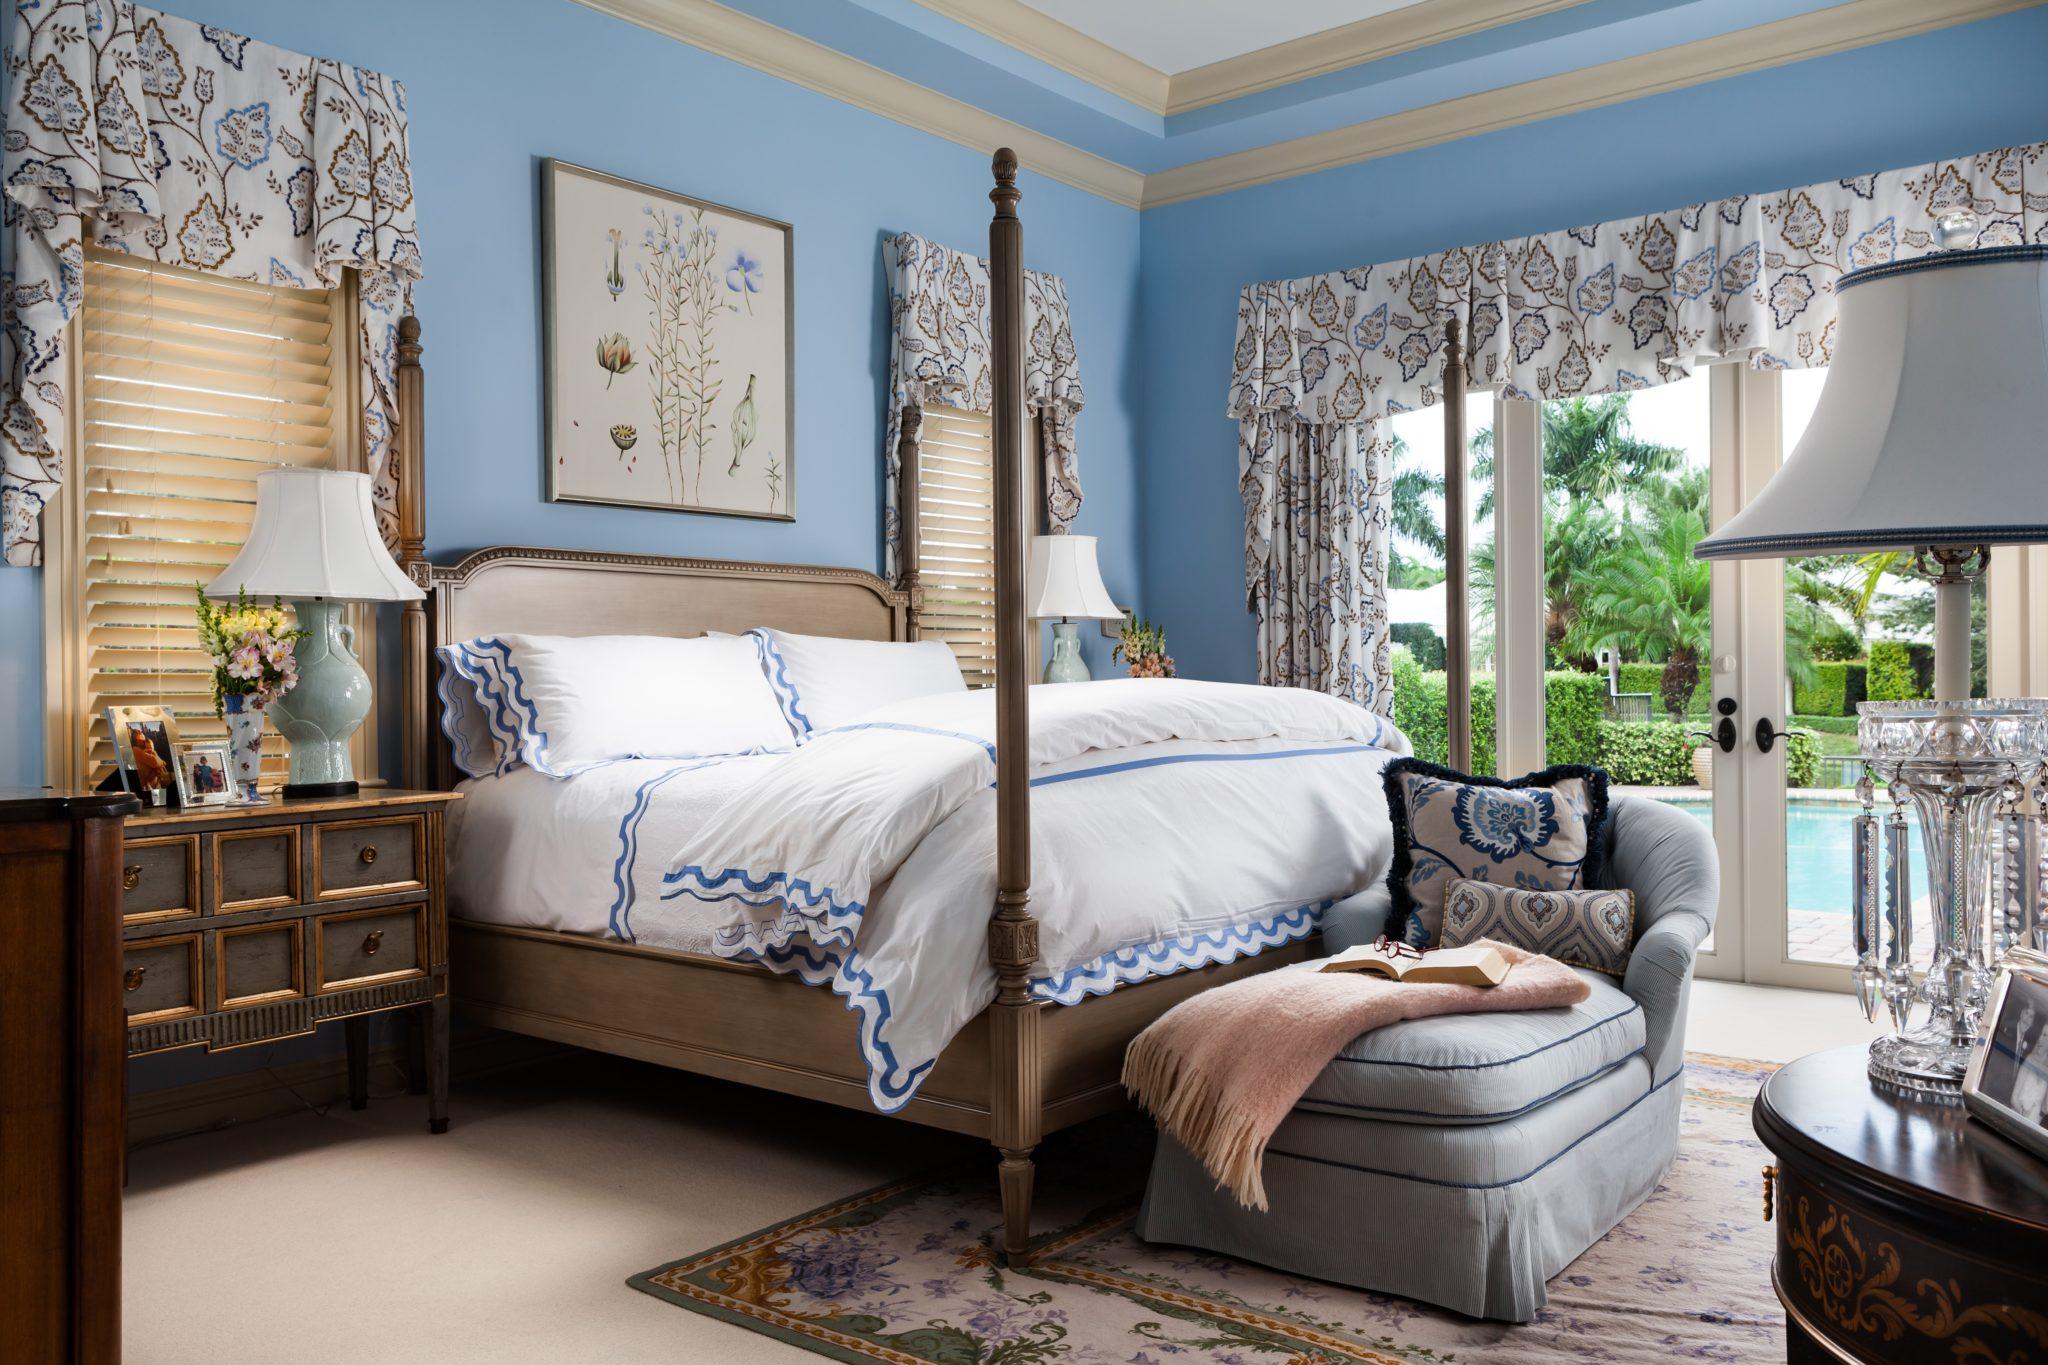 Interior design by Gil Walsh Interiors